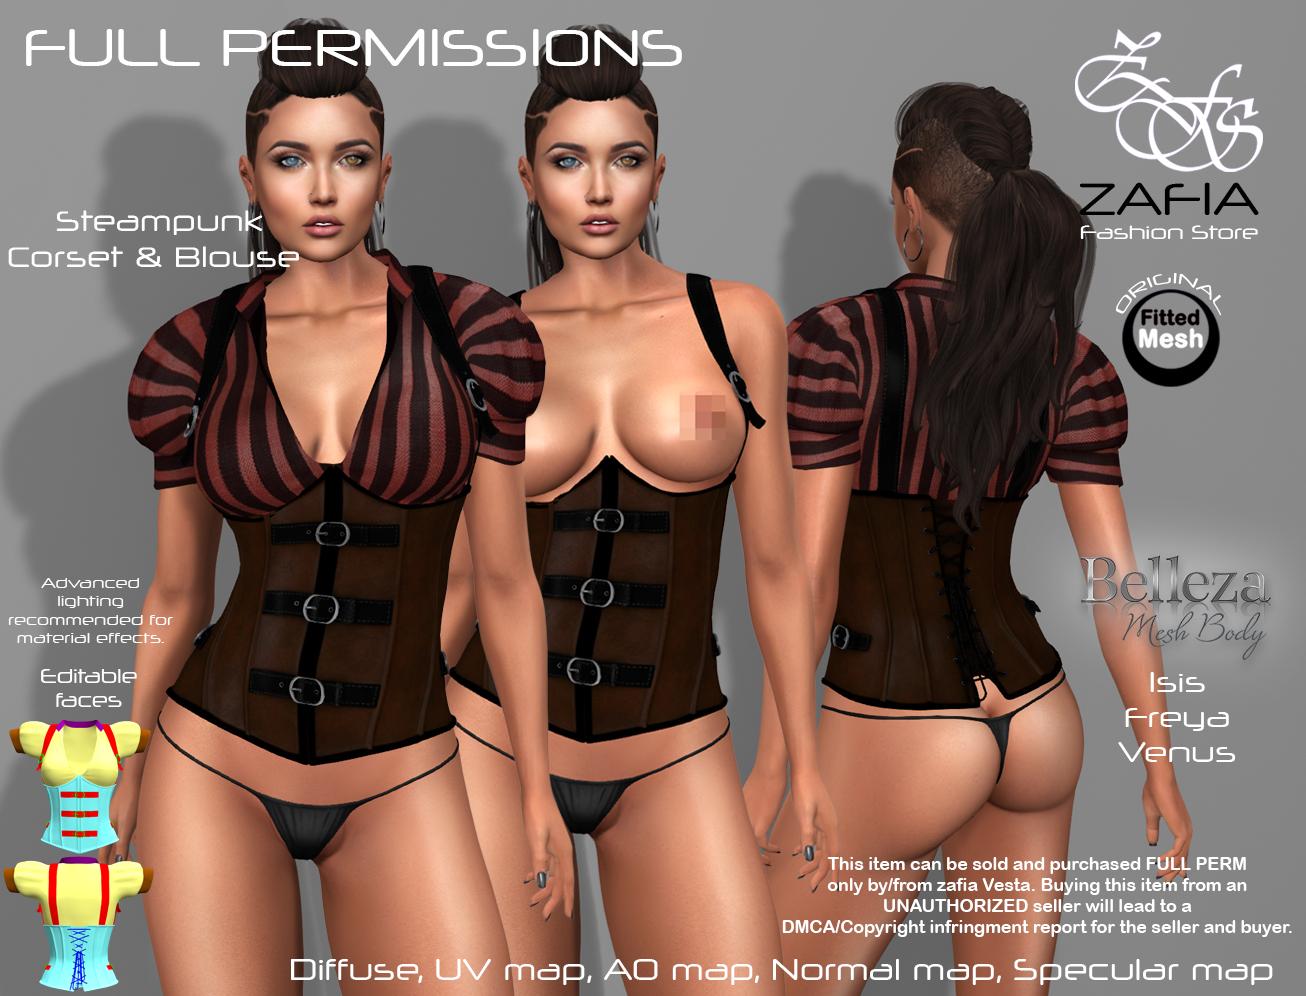 steampunk-corset-blouse-belleza